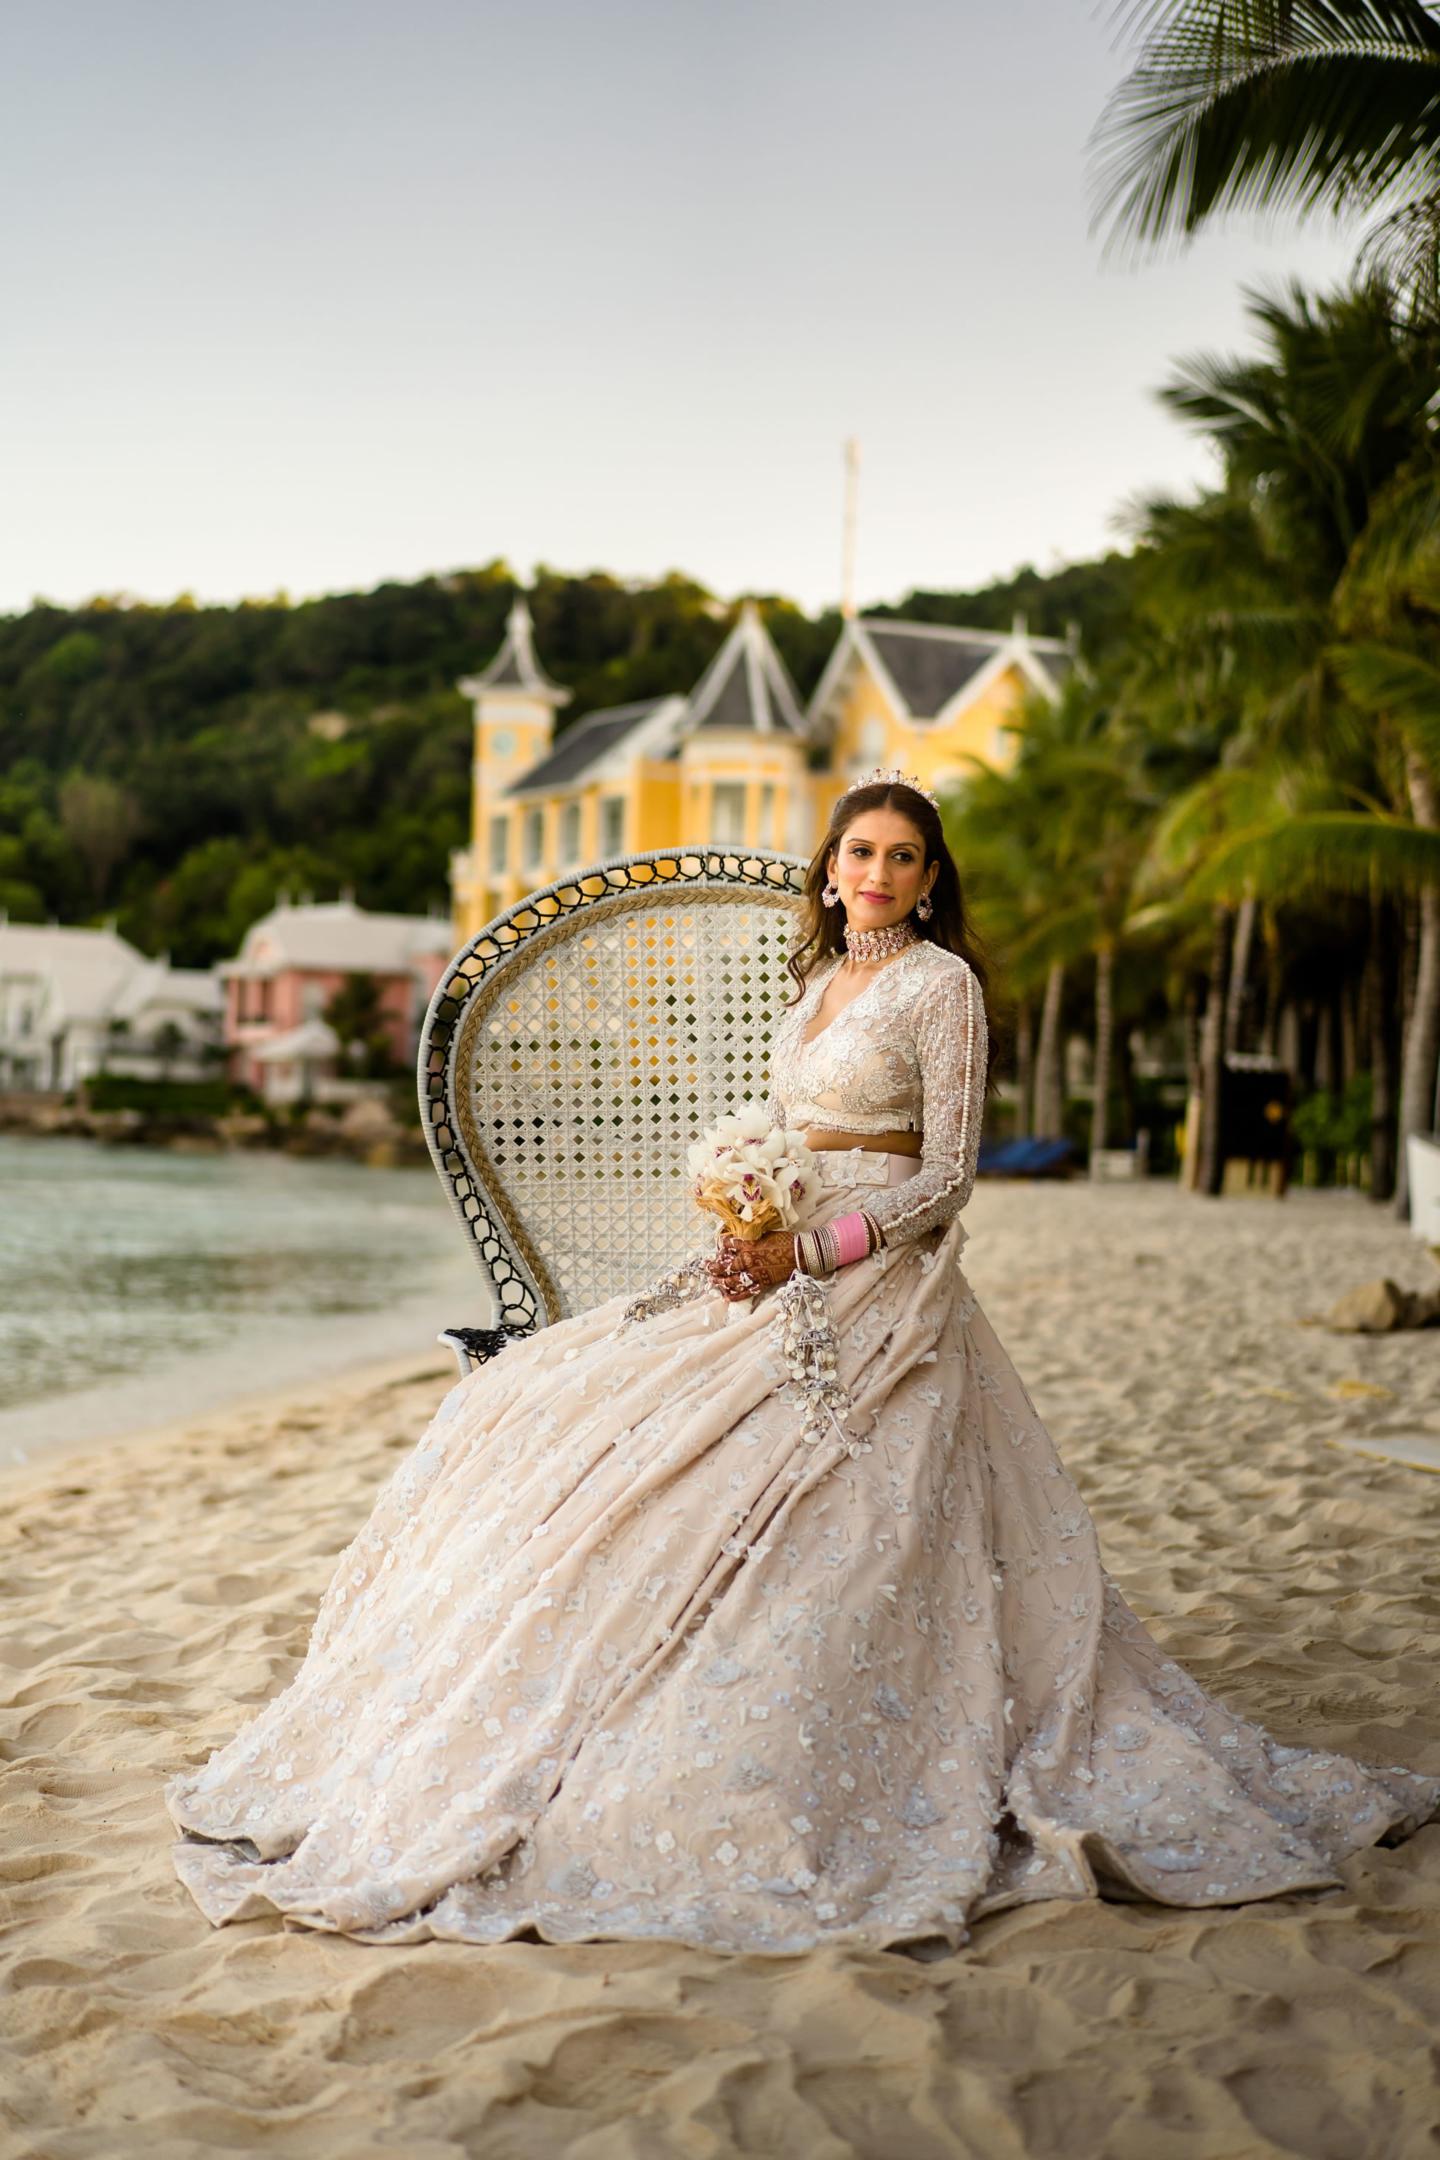 - 110 :: What an adventure: an Indian wedding in Vietnam :: Luxury wedding photography - 109 ::  - 110